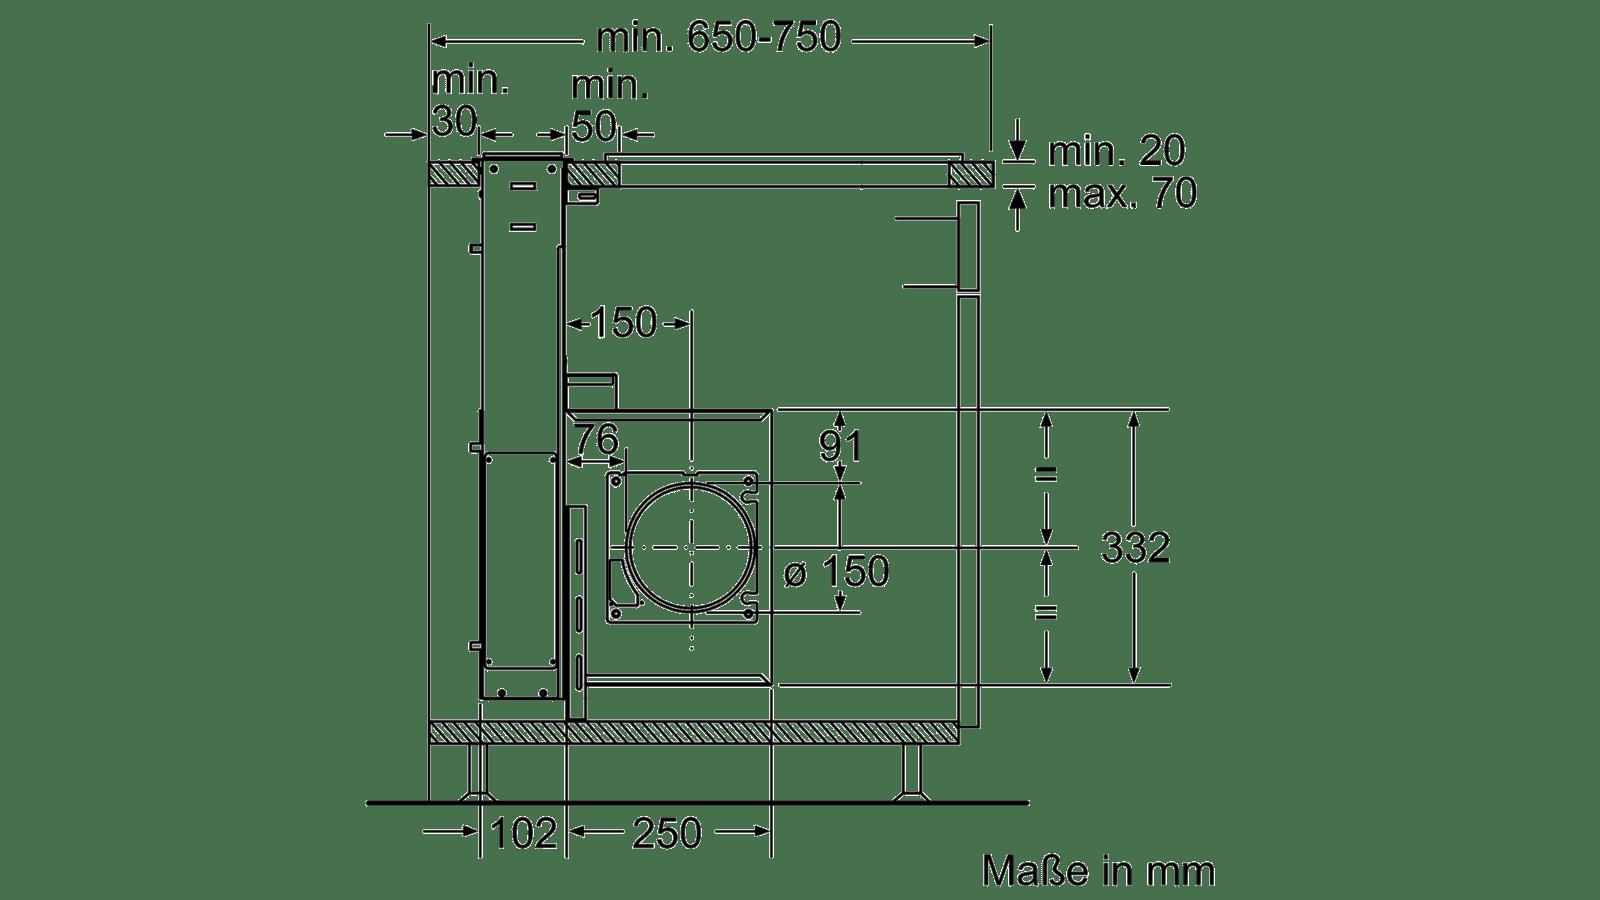 E-X Etagere Landhaus Bloom 1 ETAGE /° Holz /° ANTIK WEI/ß /° H 26 cm /° D 29 cm